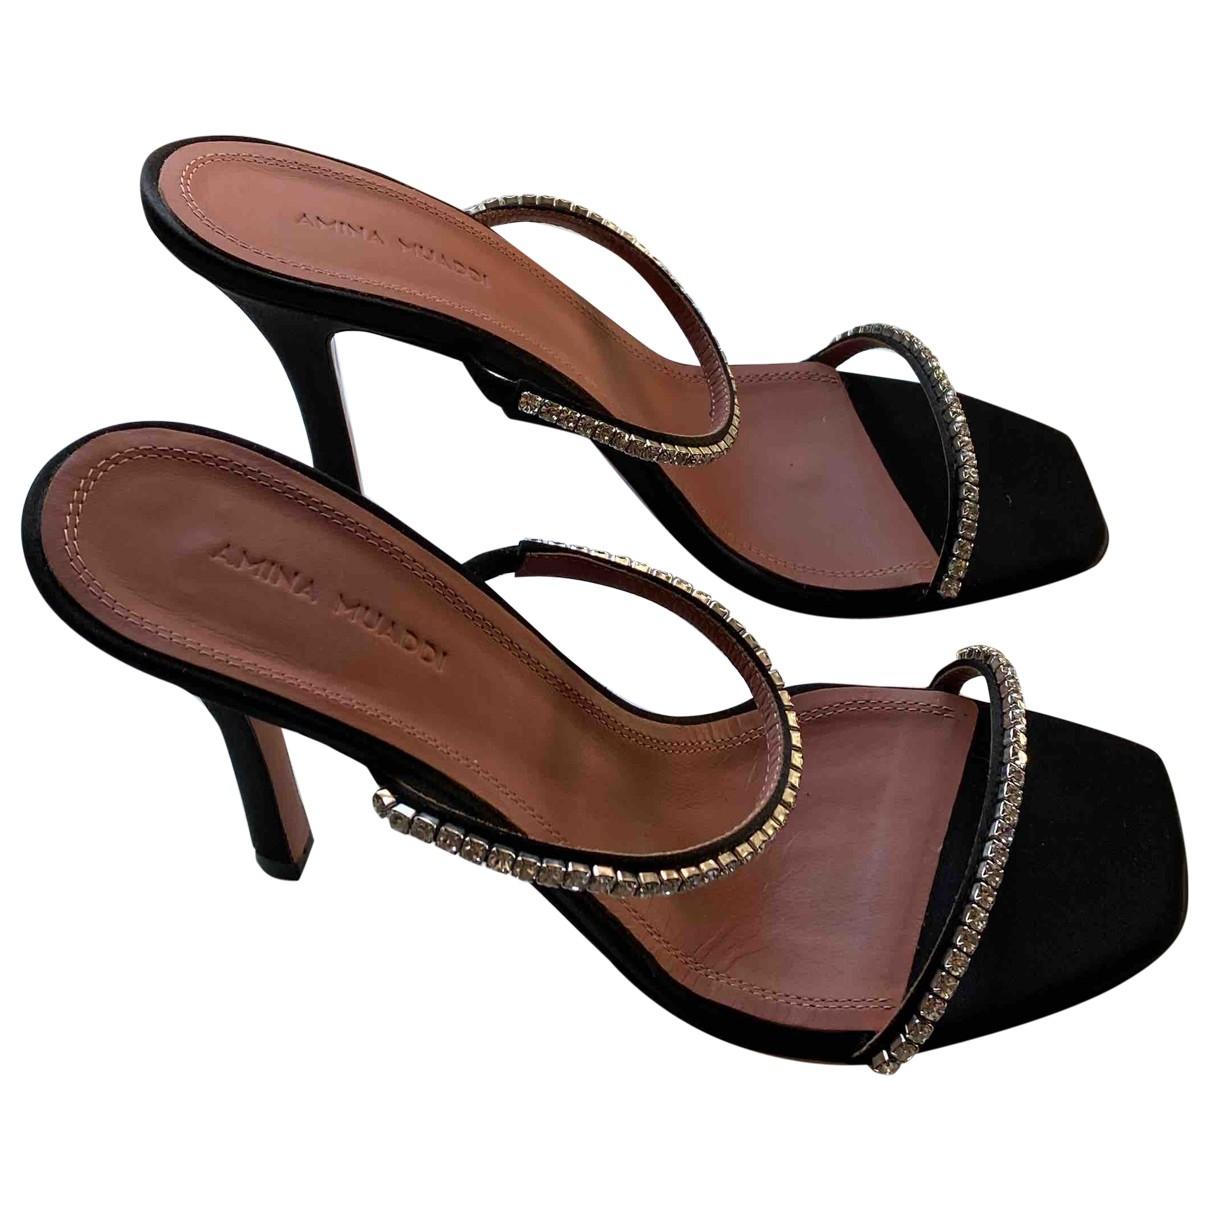 Amina Muaddi \N Black Cloth Sandals for Women 38.5 EU